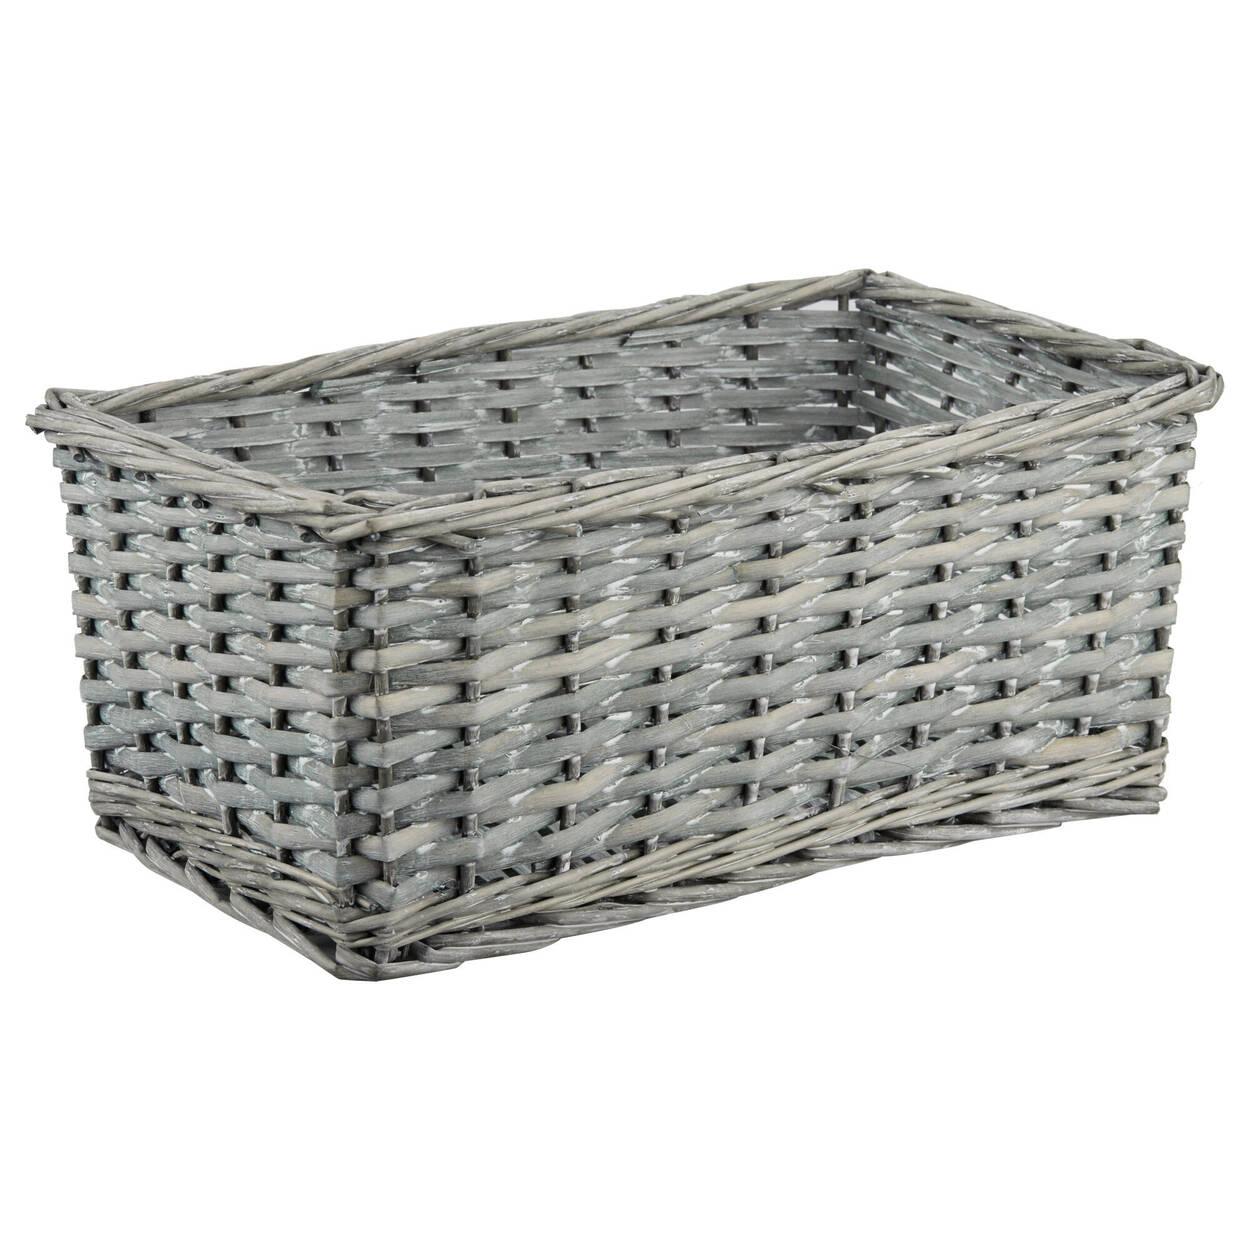 Willow Storage Basket